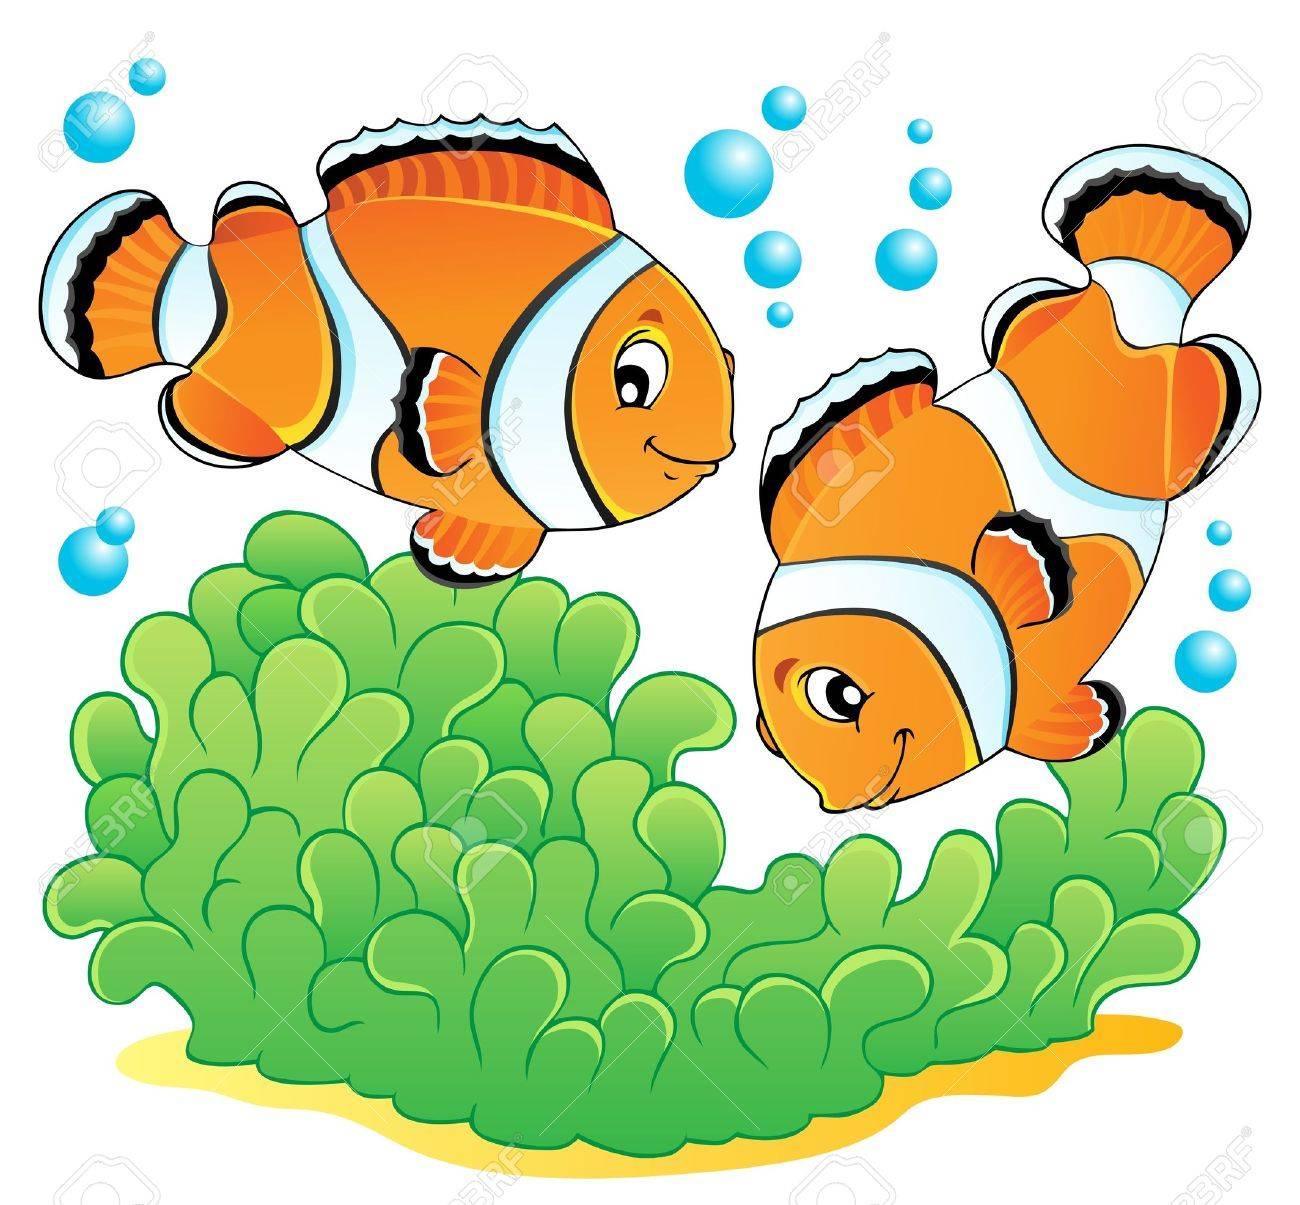 Clown fish theme image 1 illustration - 14603755